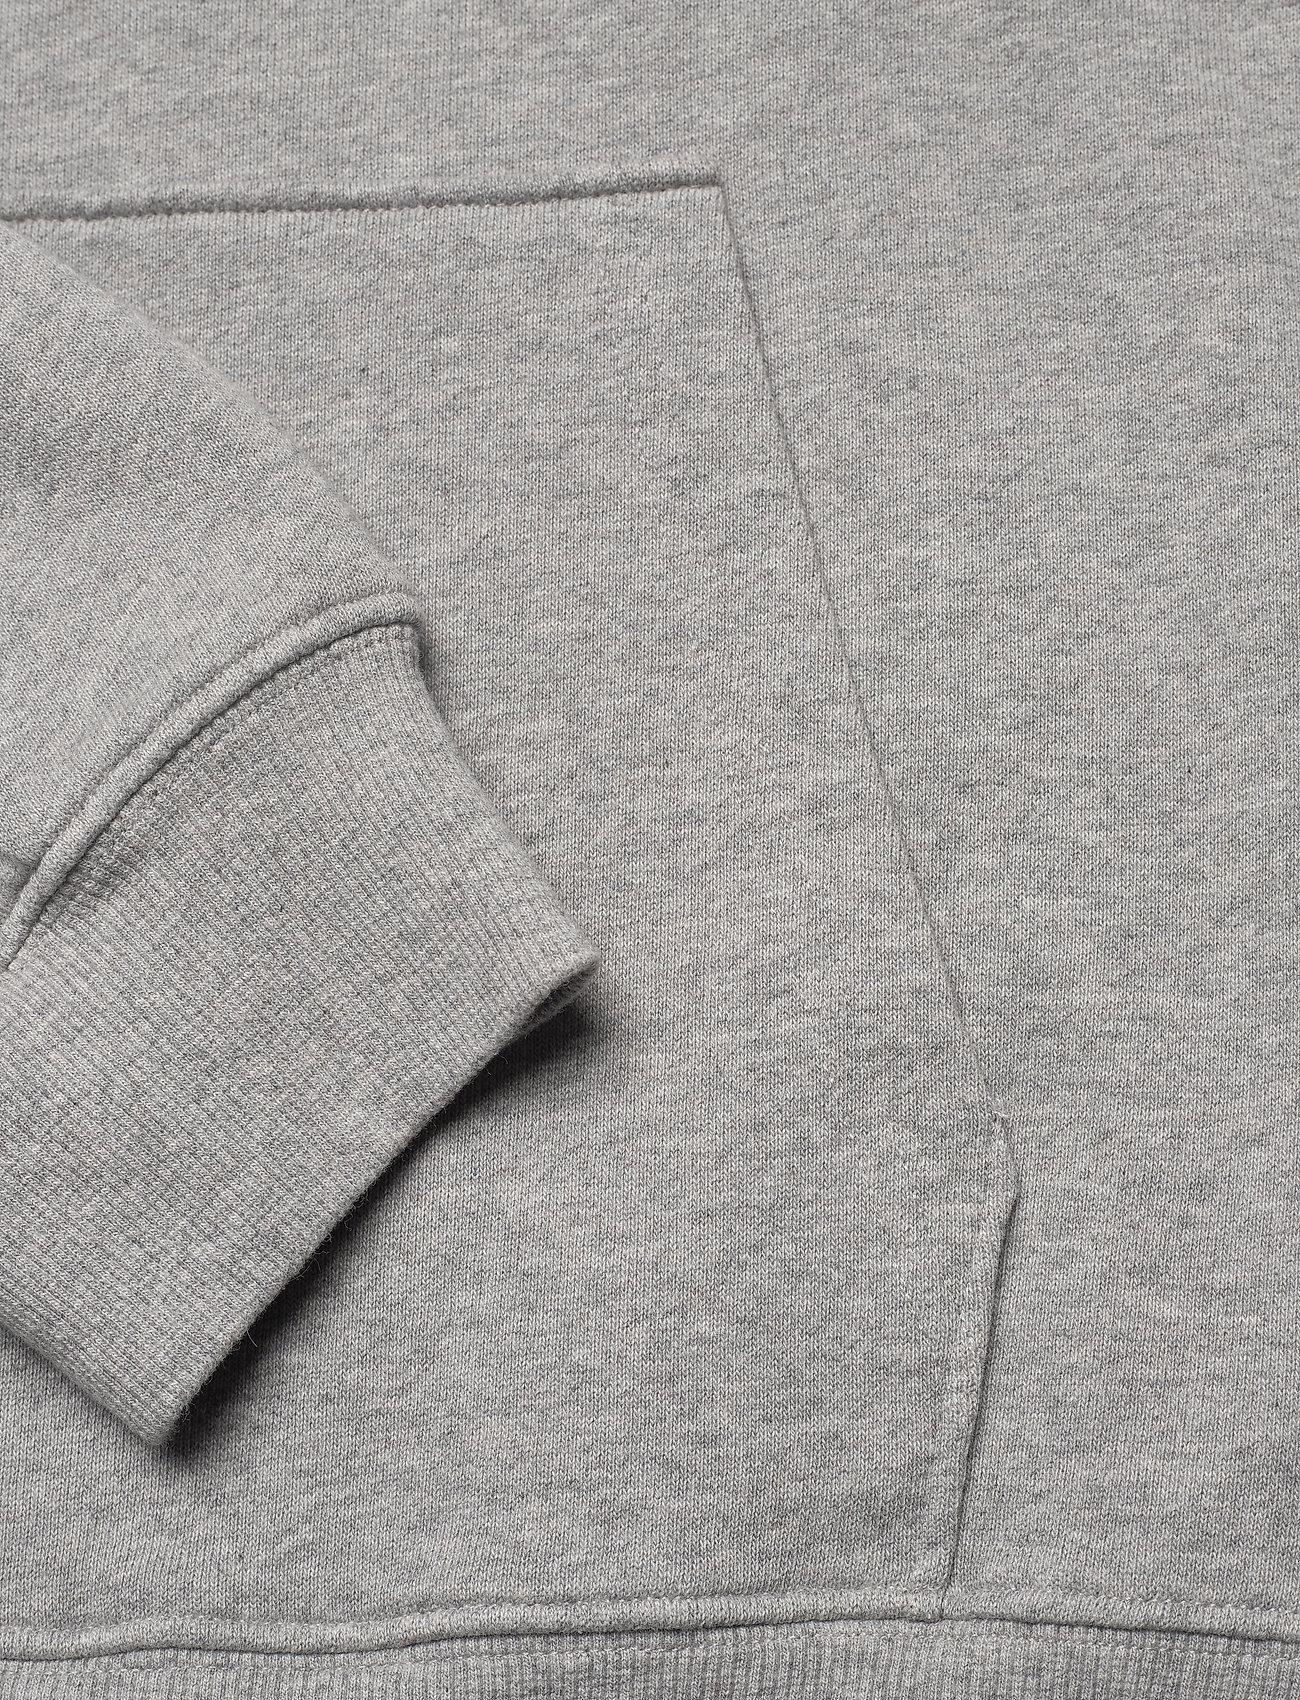 Zadig & Voltaire - STORM MO PHOTOPRINT ZV FACTORY SWEATSHIRT CAPSULE - basic sweatshirts - gris chine clair - 3